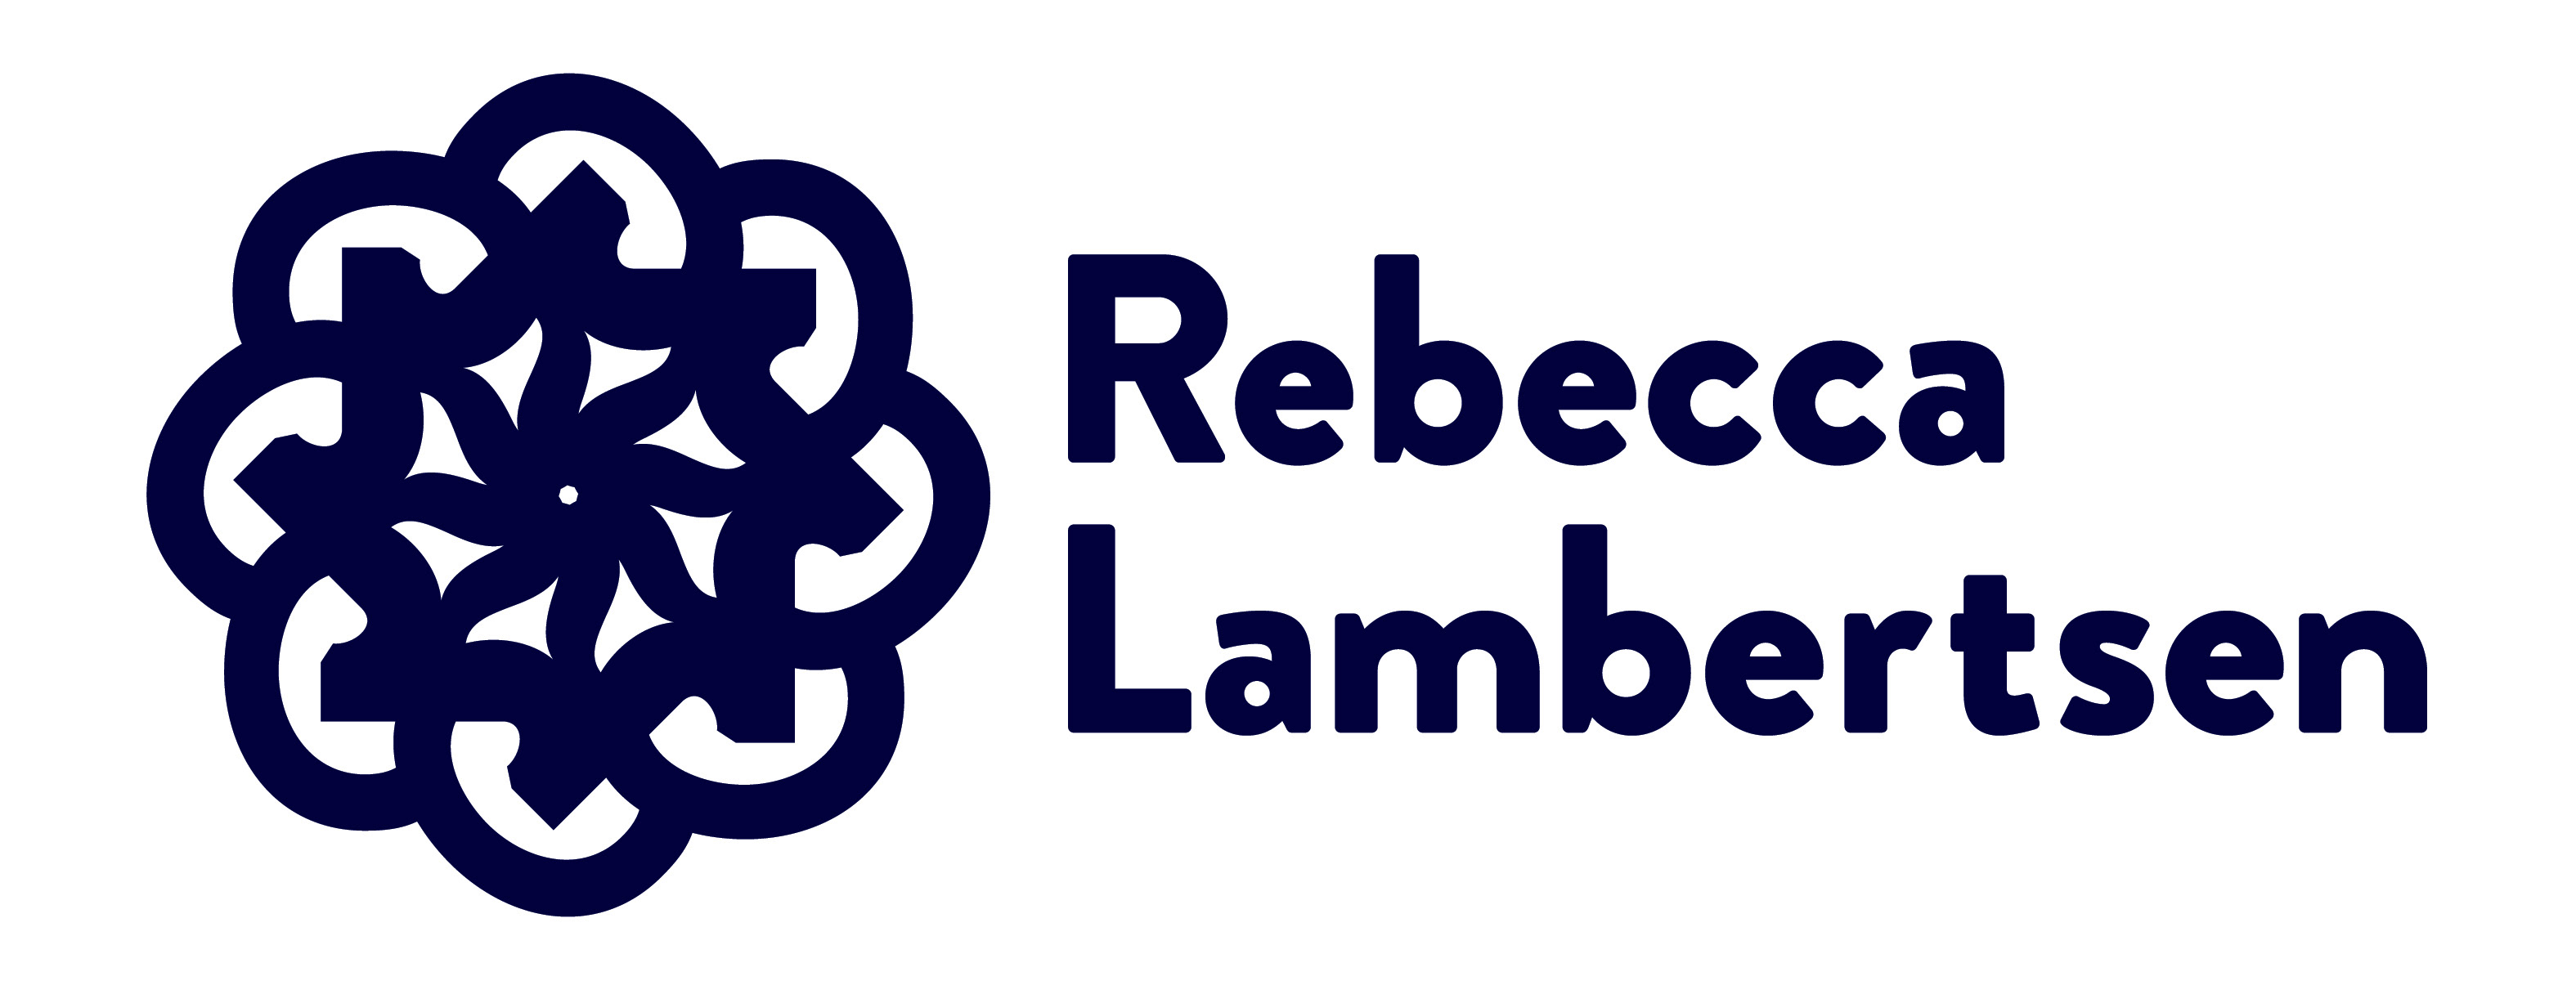 Rebecca Lambertsen